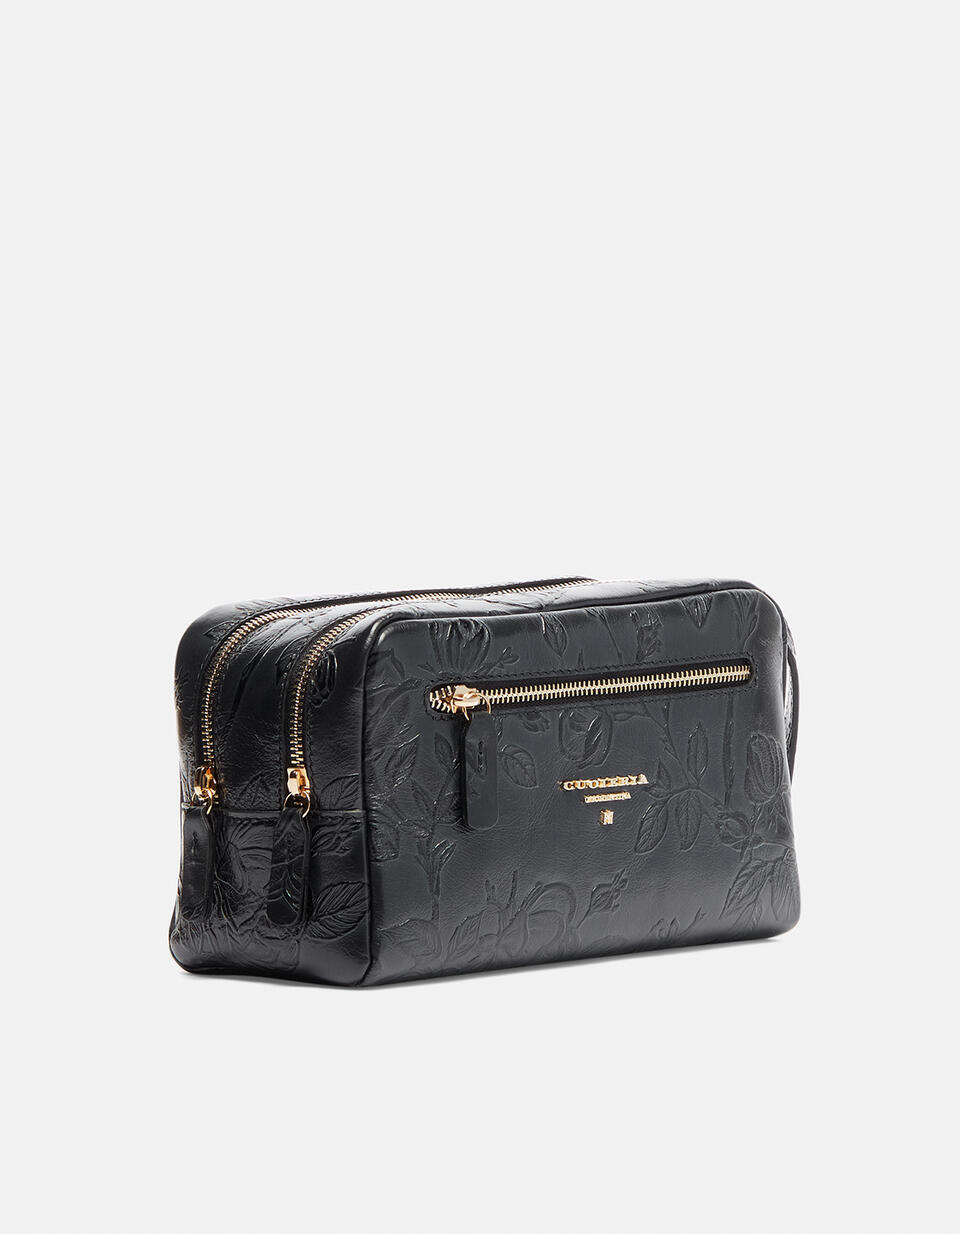 Classic Mimì beauty case with two compartments  Cuoieria Fiorentina